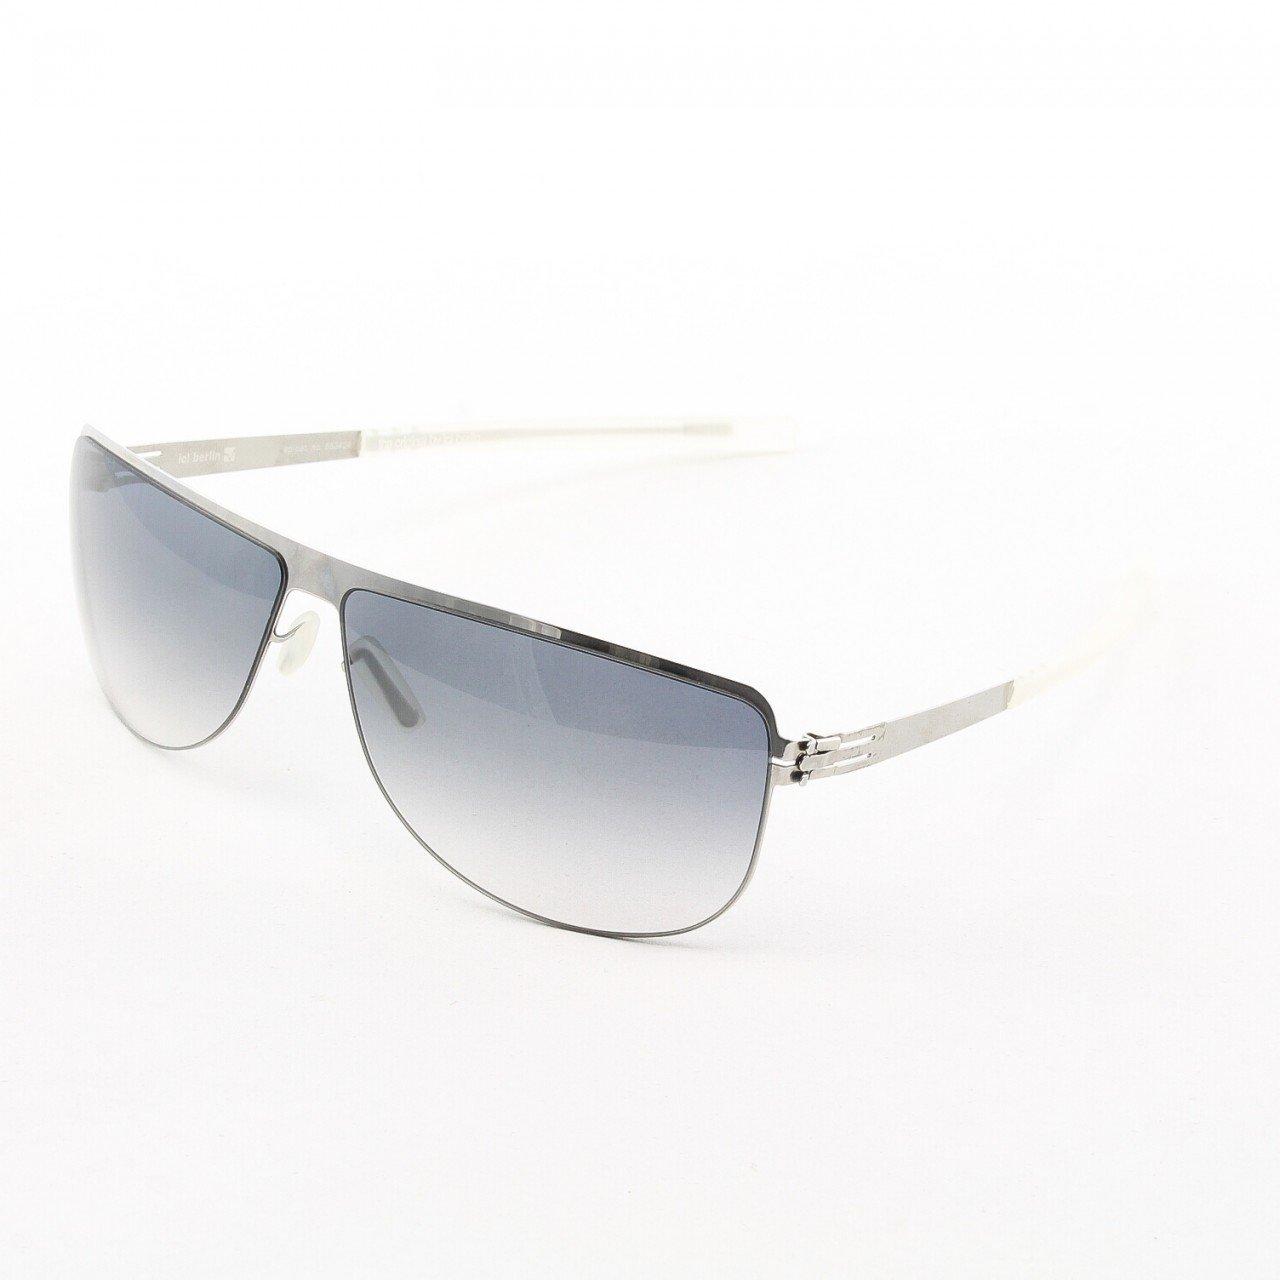 ic! Berlin Anselm Sunglasses Col. Chrome with Black Gradient Lenses